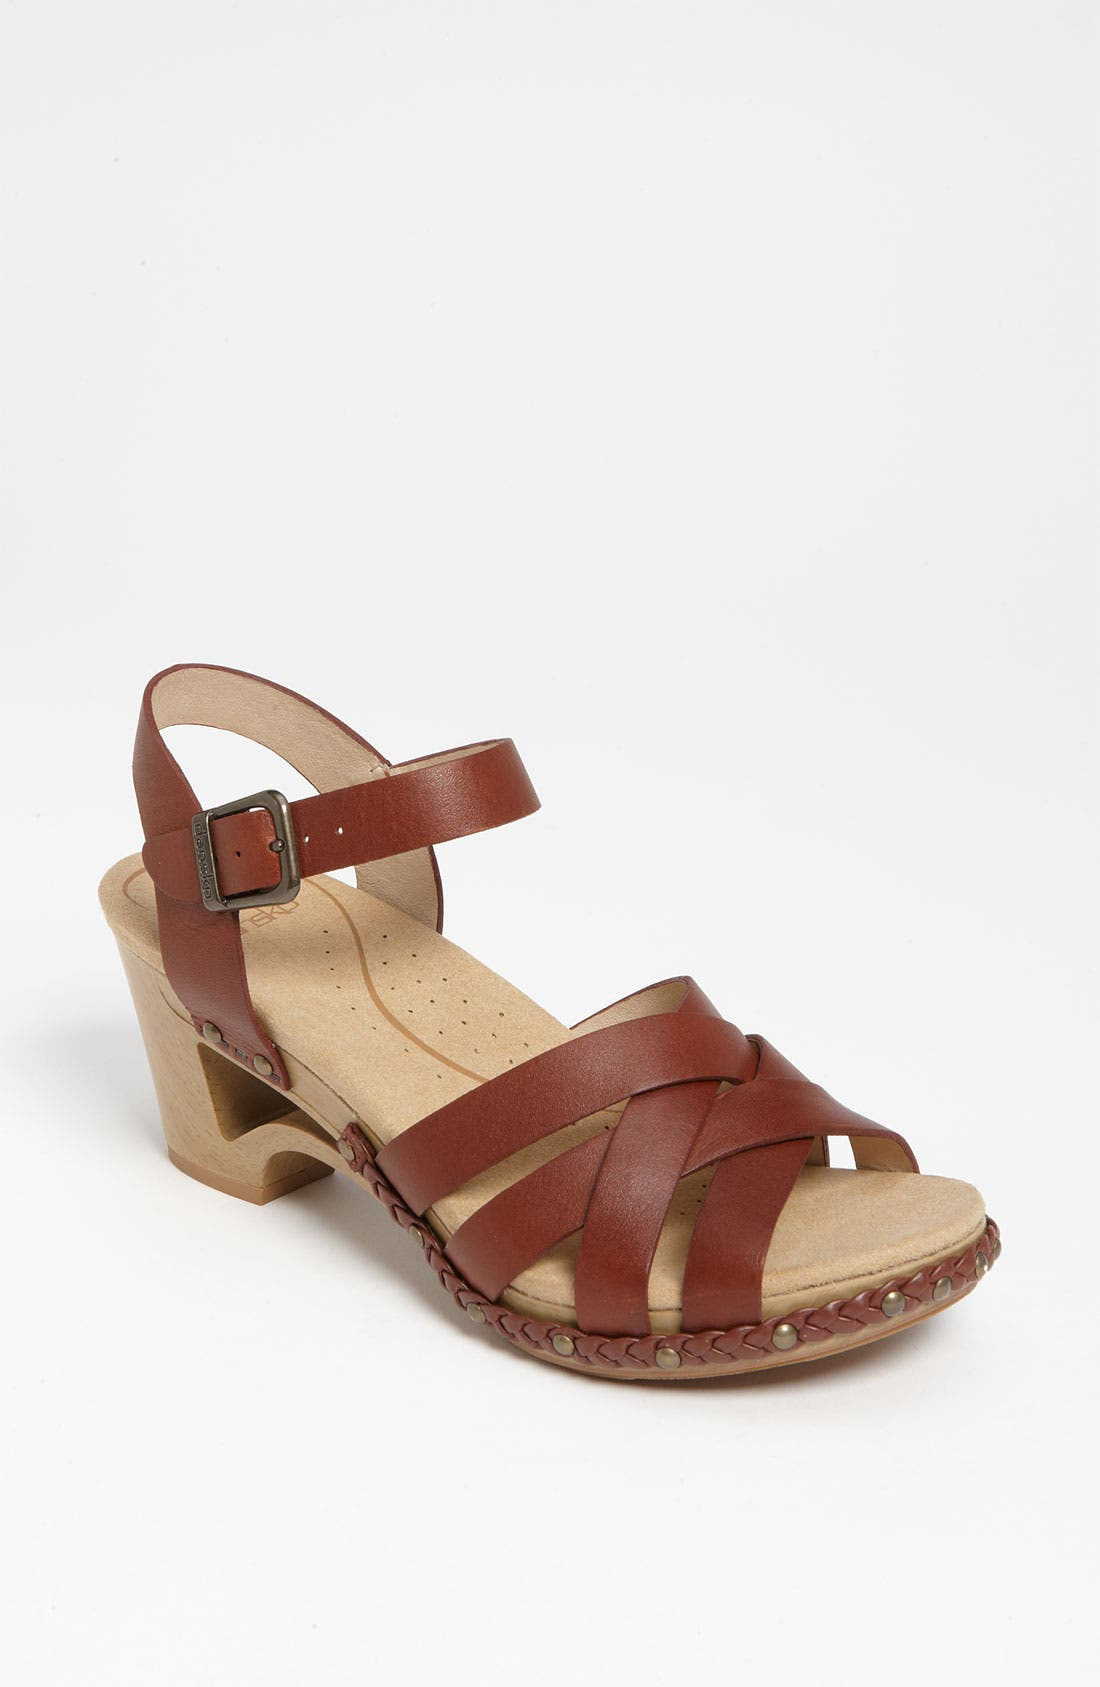 Alternate Image 1 Selected - Dansko 'Tru Clog' Sandal